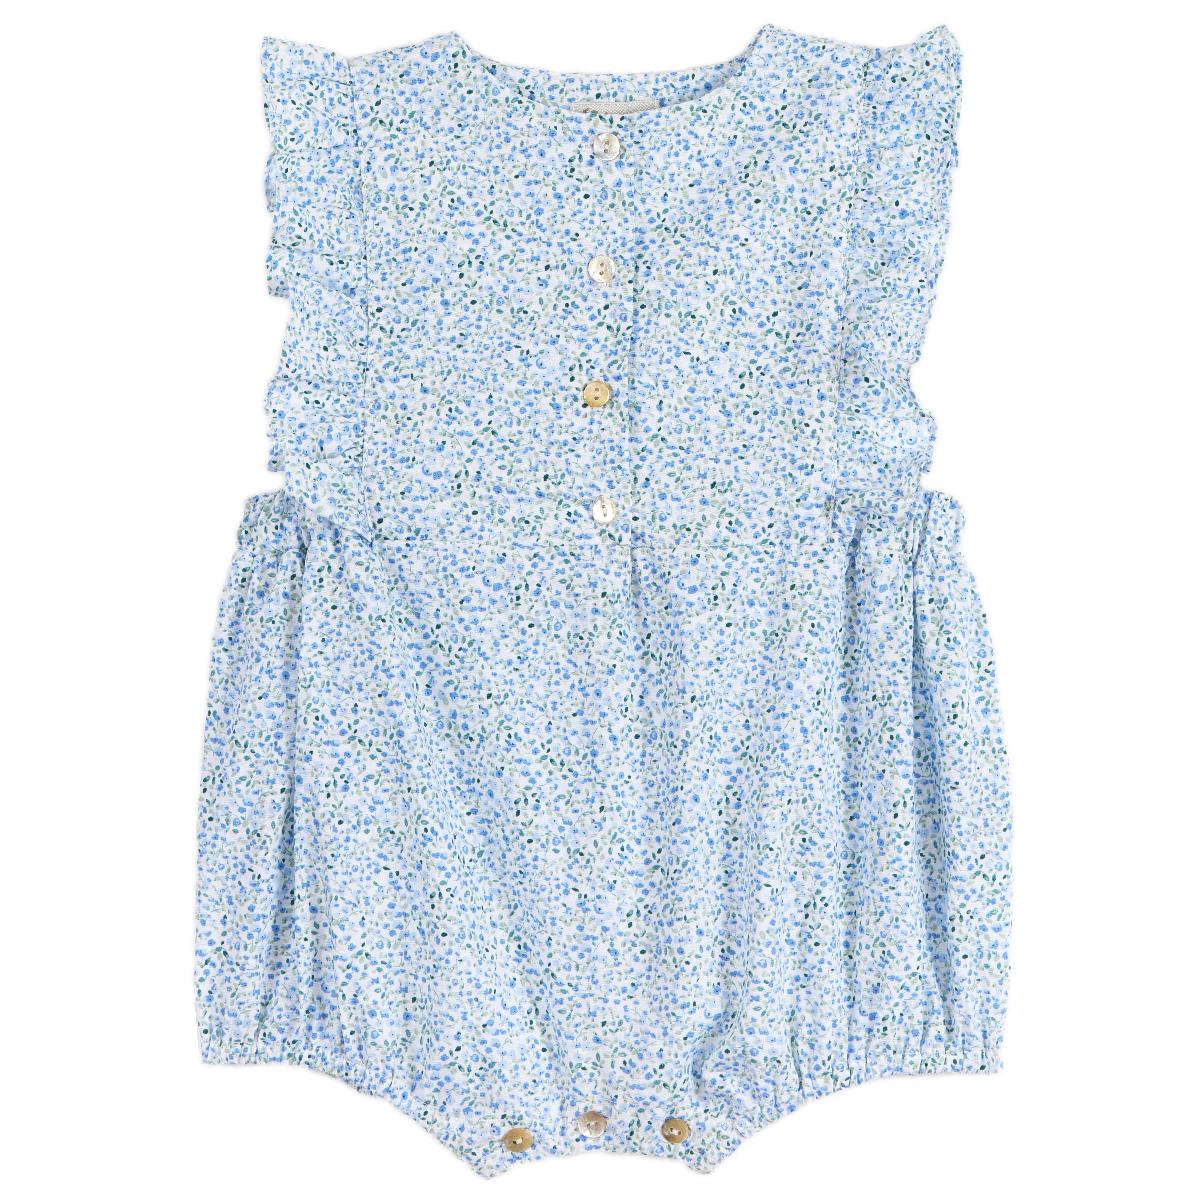 combinaison-bébé-Florentine-liberty_bleu